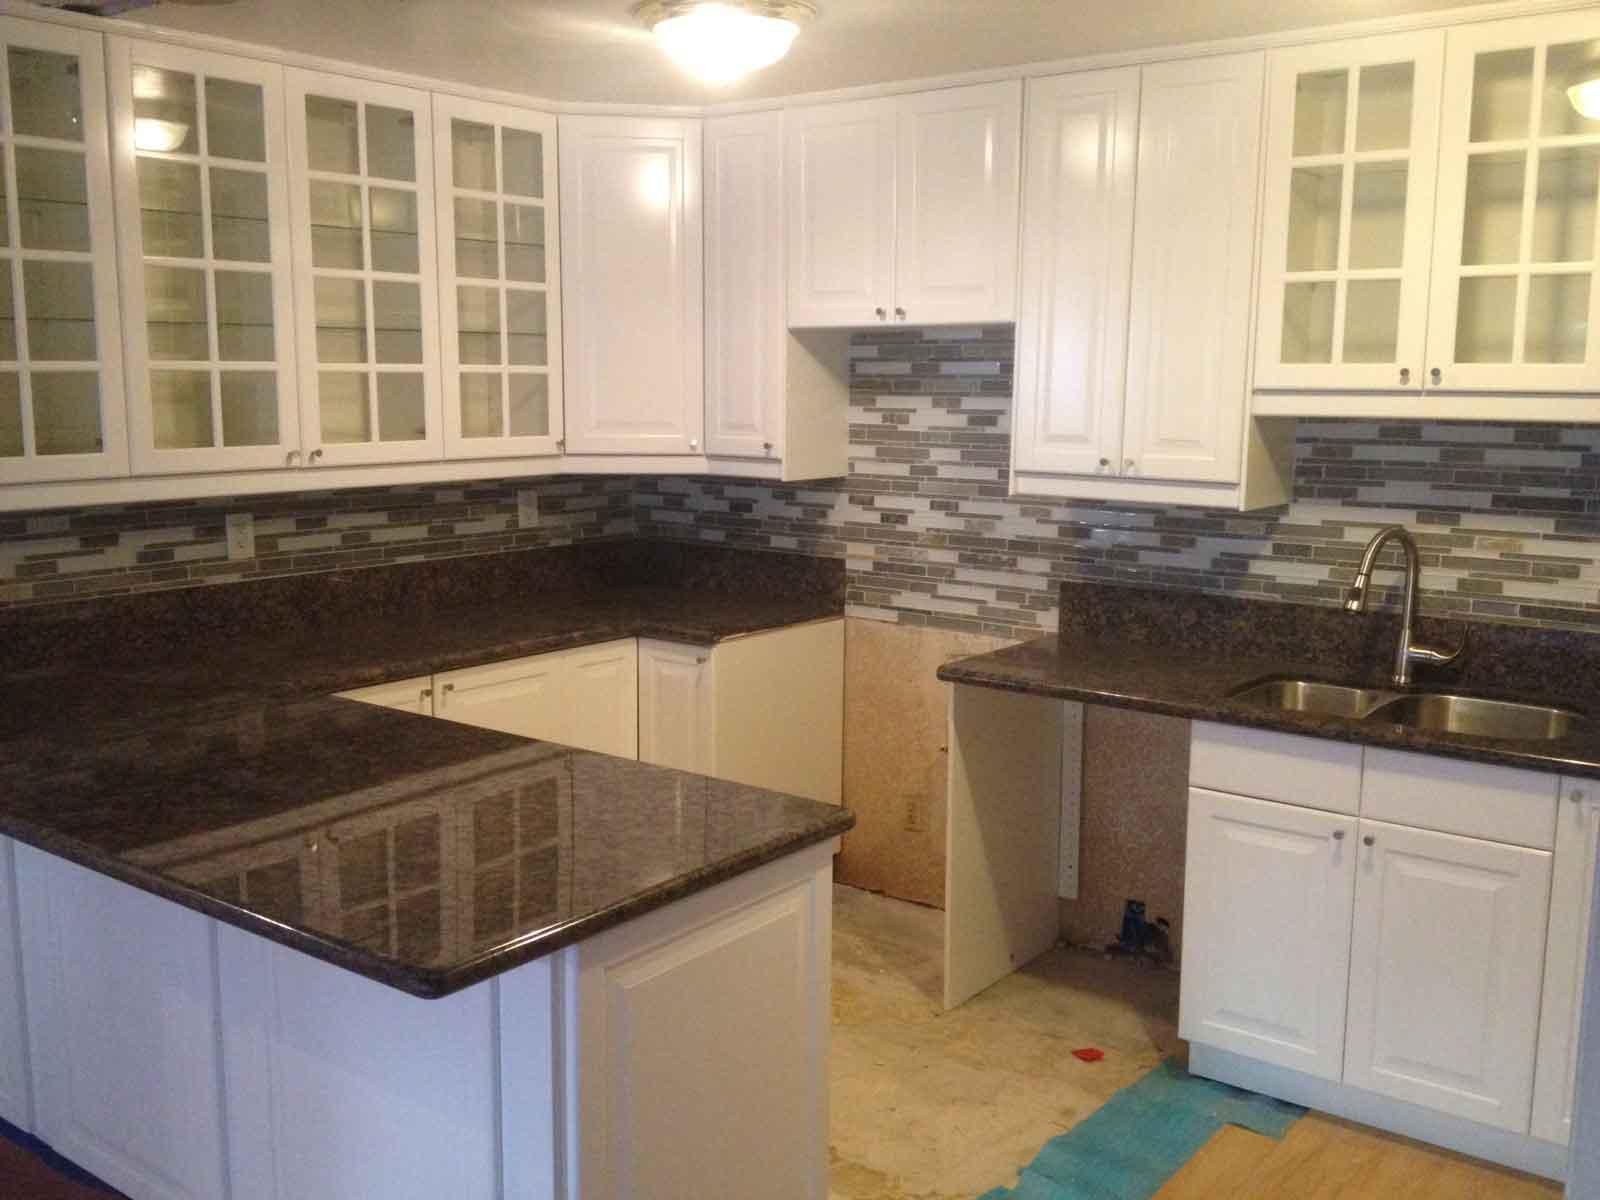 Granite Countertops Cost Per Linear Foot : ... Countertops Cost New Kitchen Cabinets And Countertops Cost Excellent